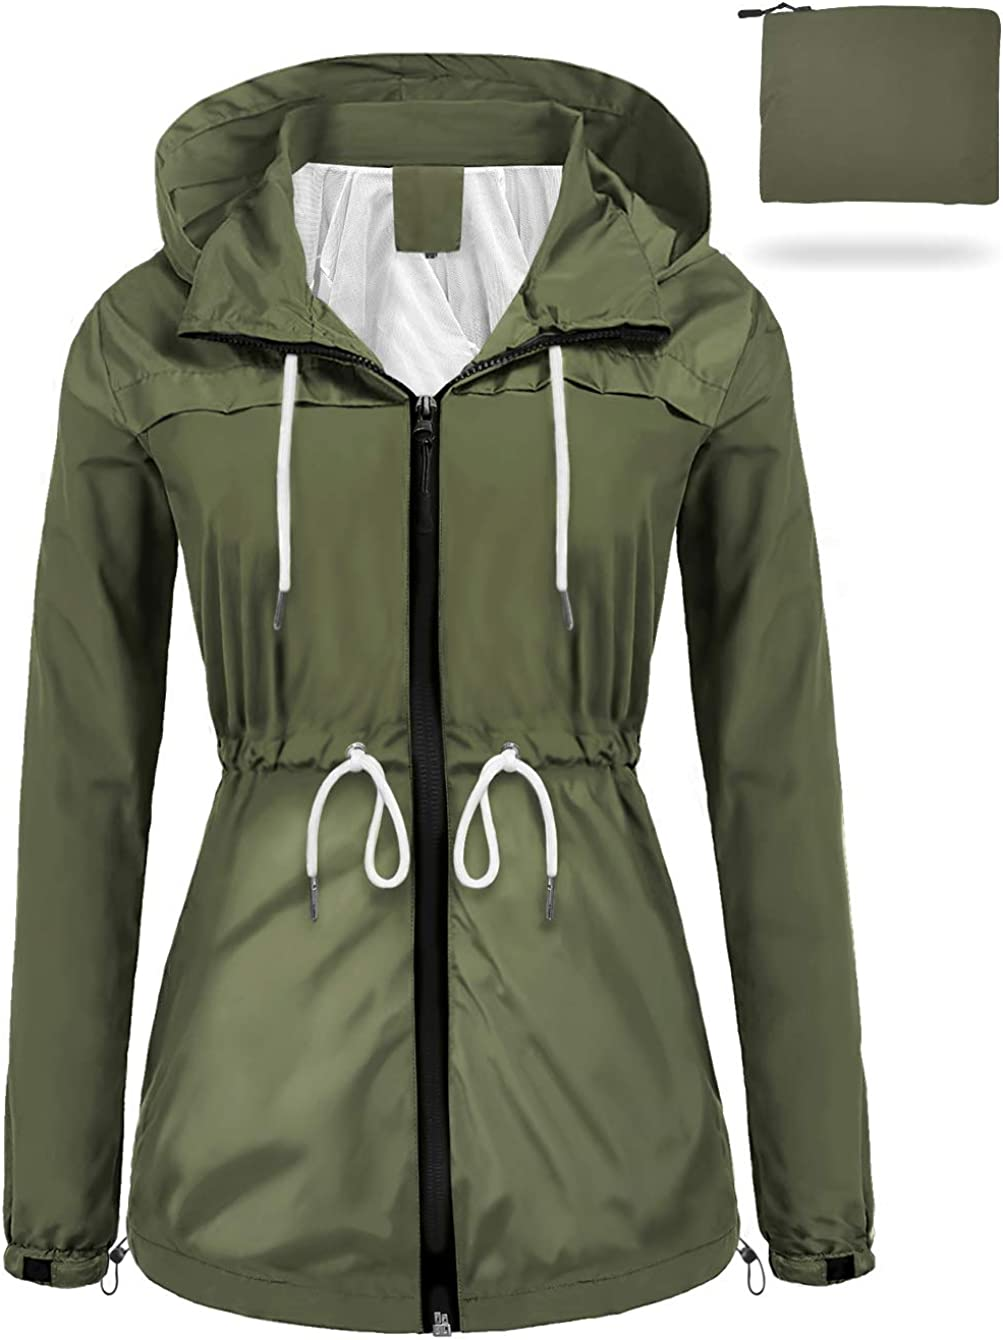 sunseen Recommendation Women's Outdoor Waterproof Purchase Lightweight Packable Raincoat